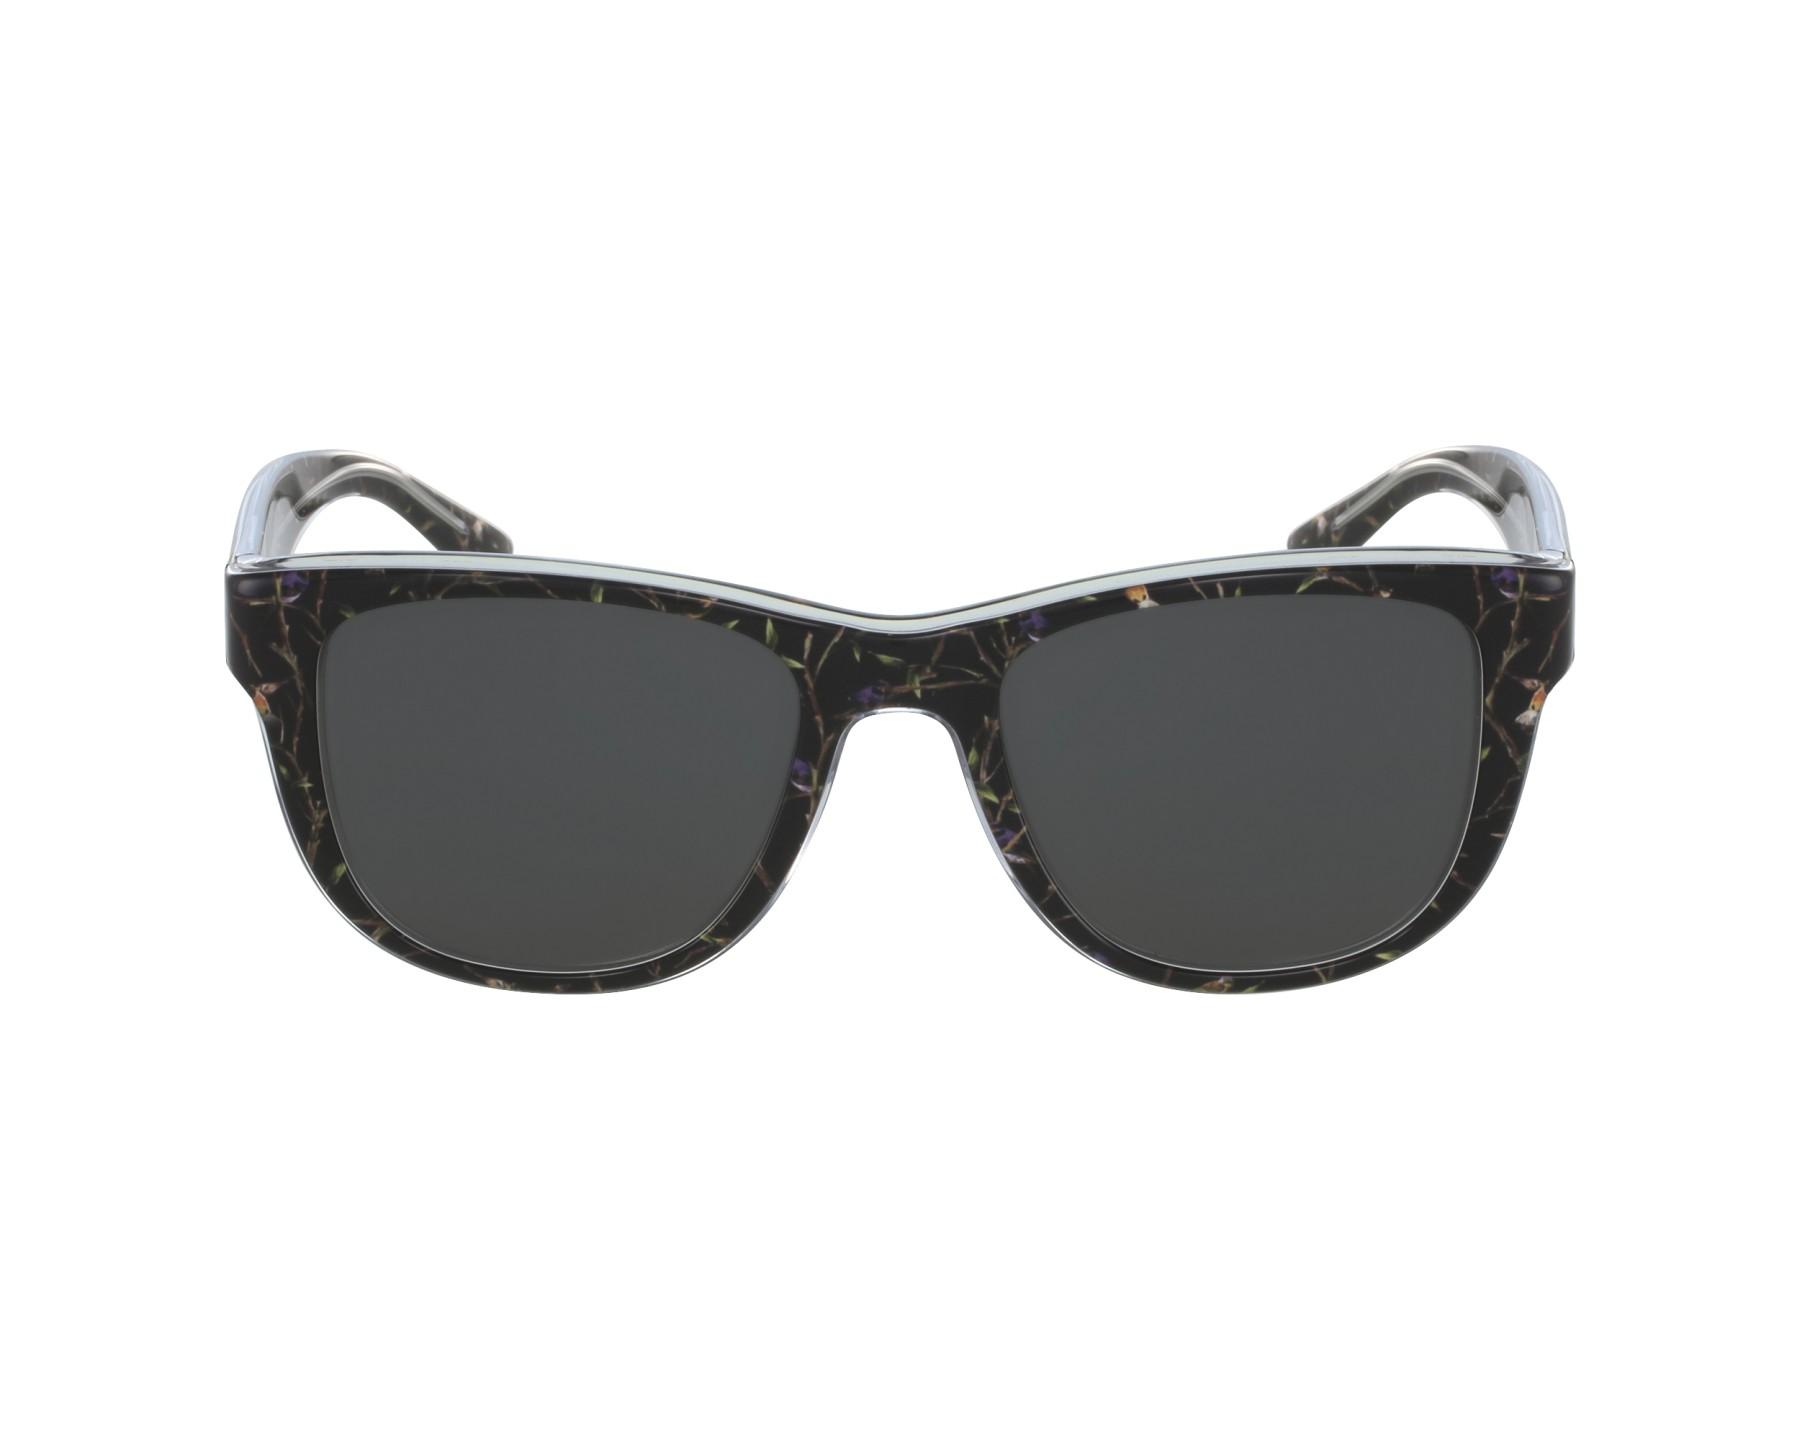 b5c613c28aff Get Free Shipping on DOLCE   GABBANA Sunglasses DG4284 ...